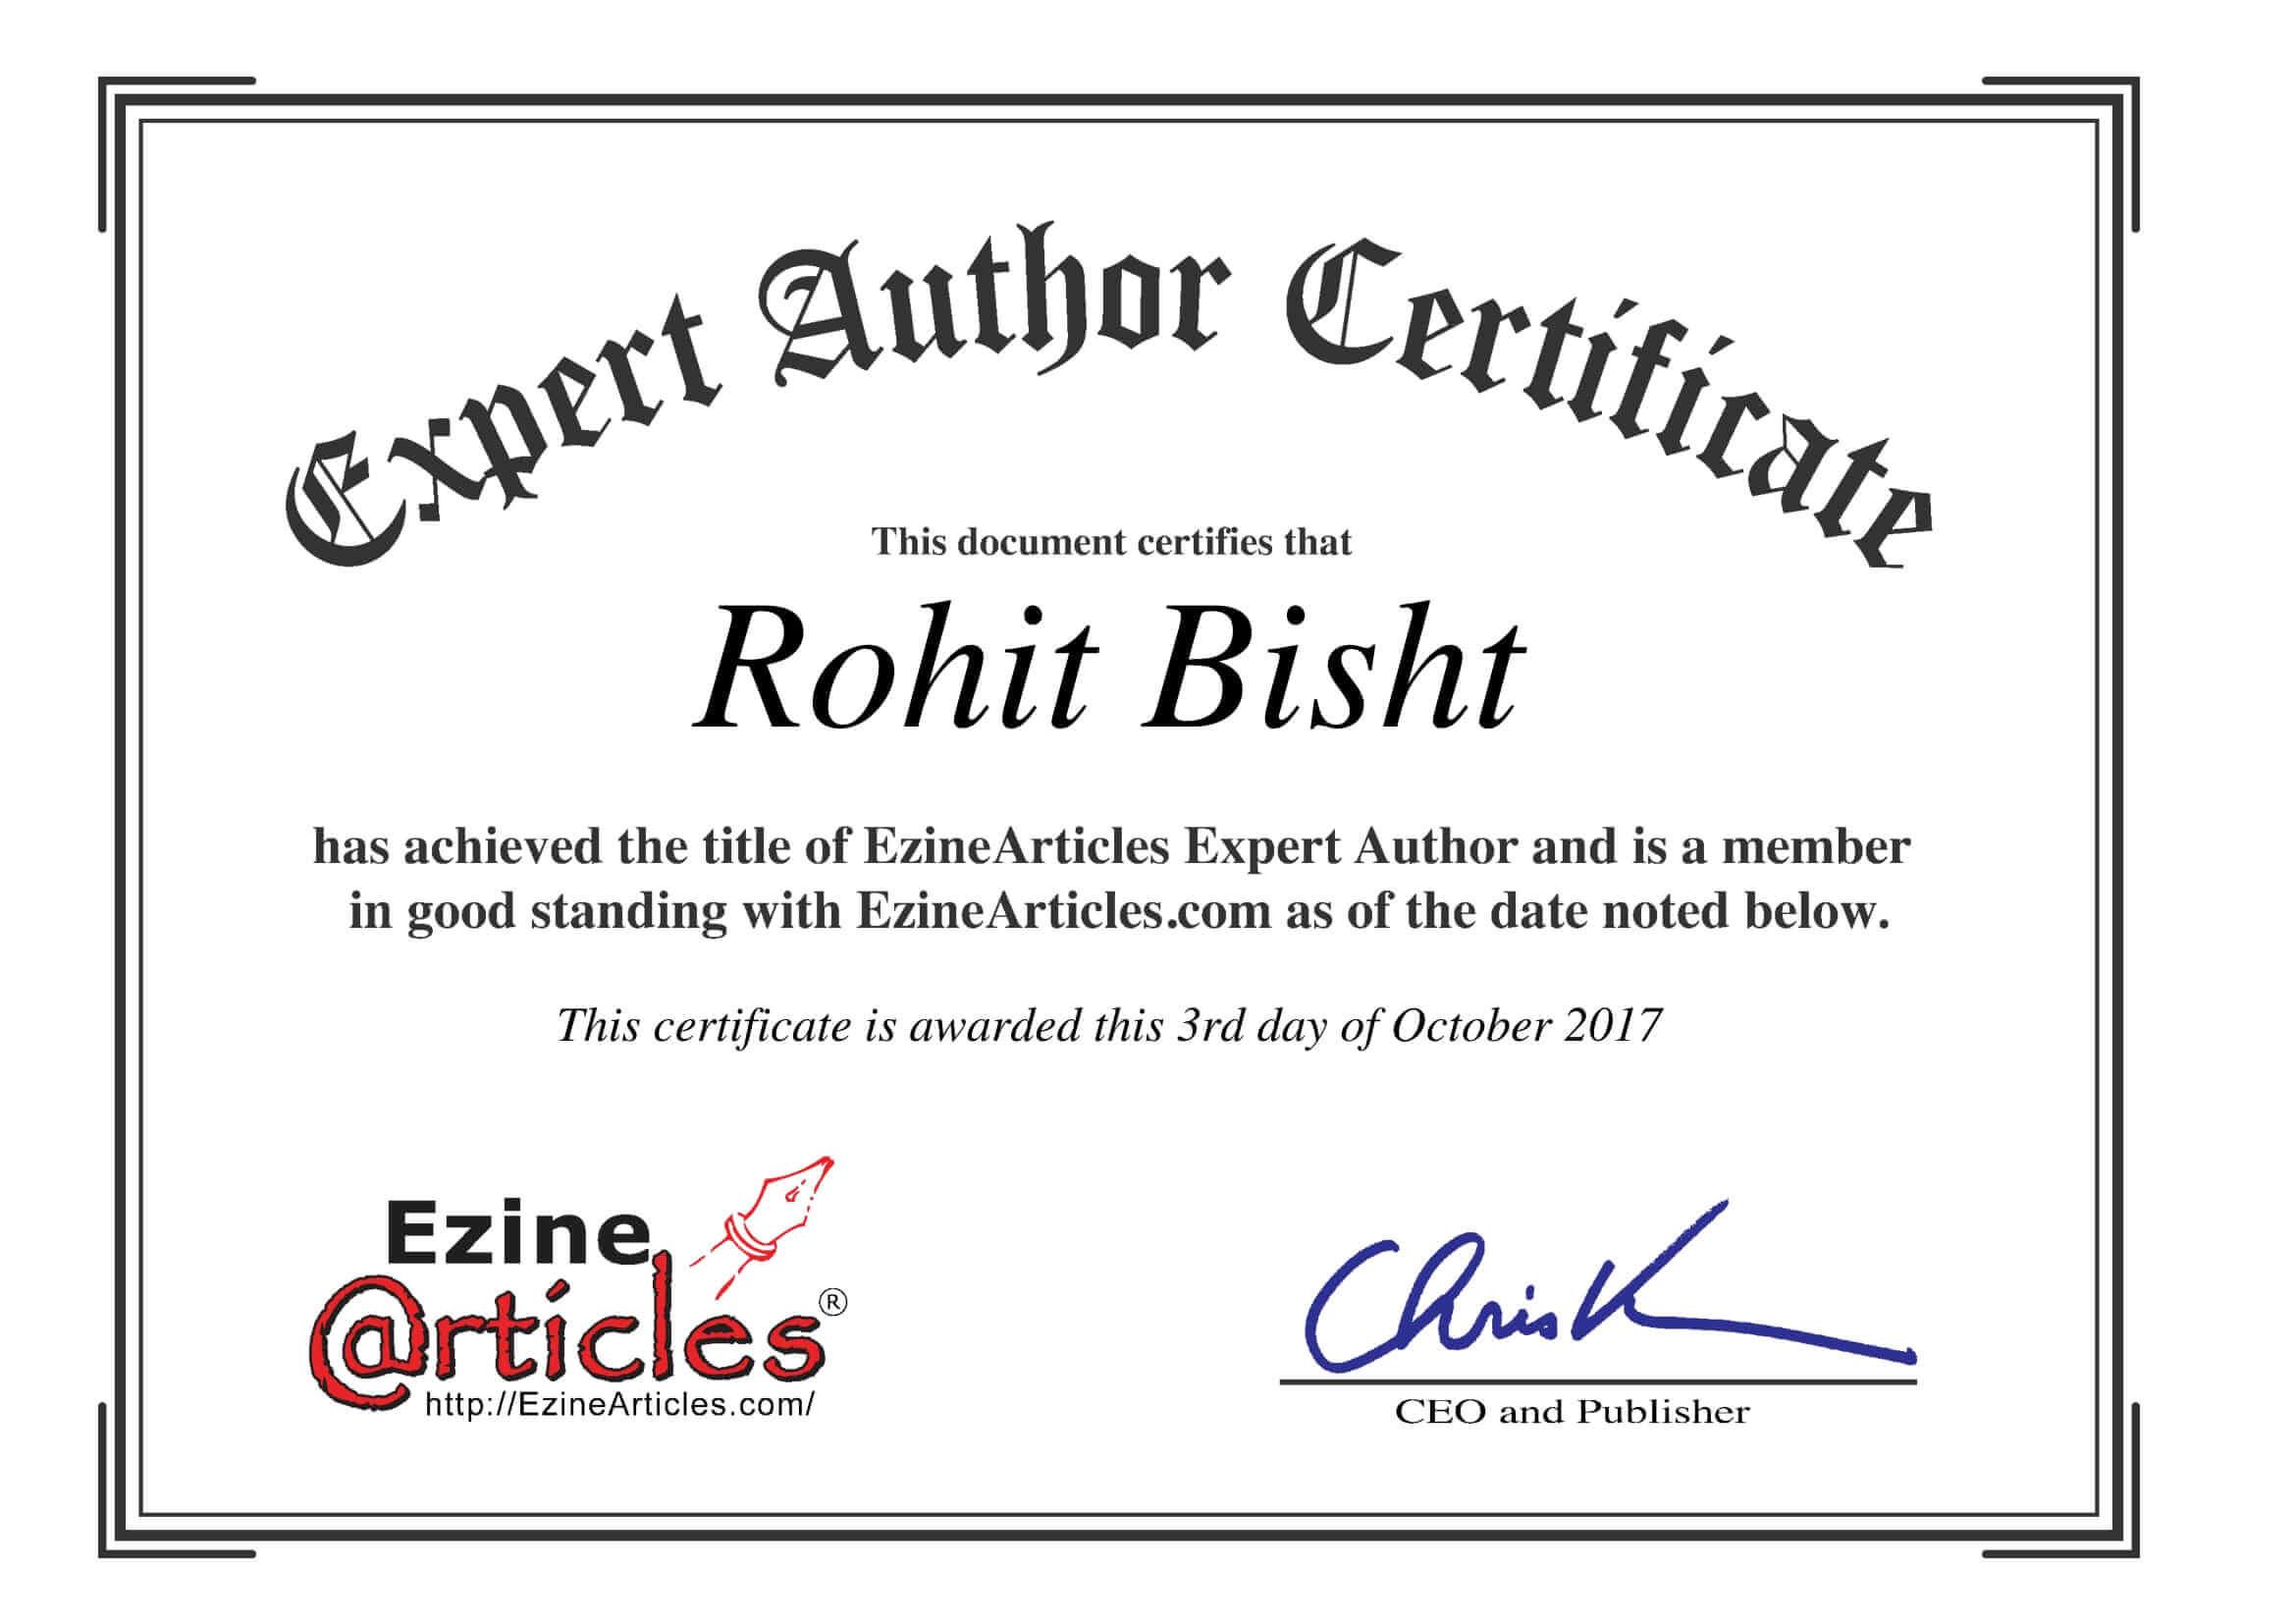 Rohit Bisht Ezine Article Expert